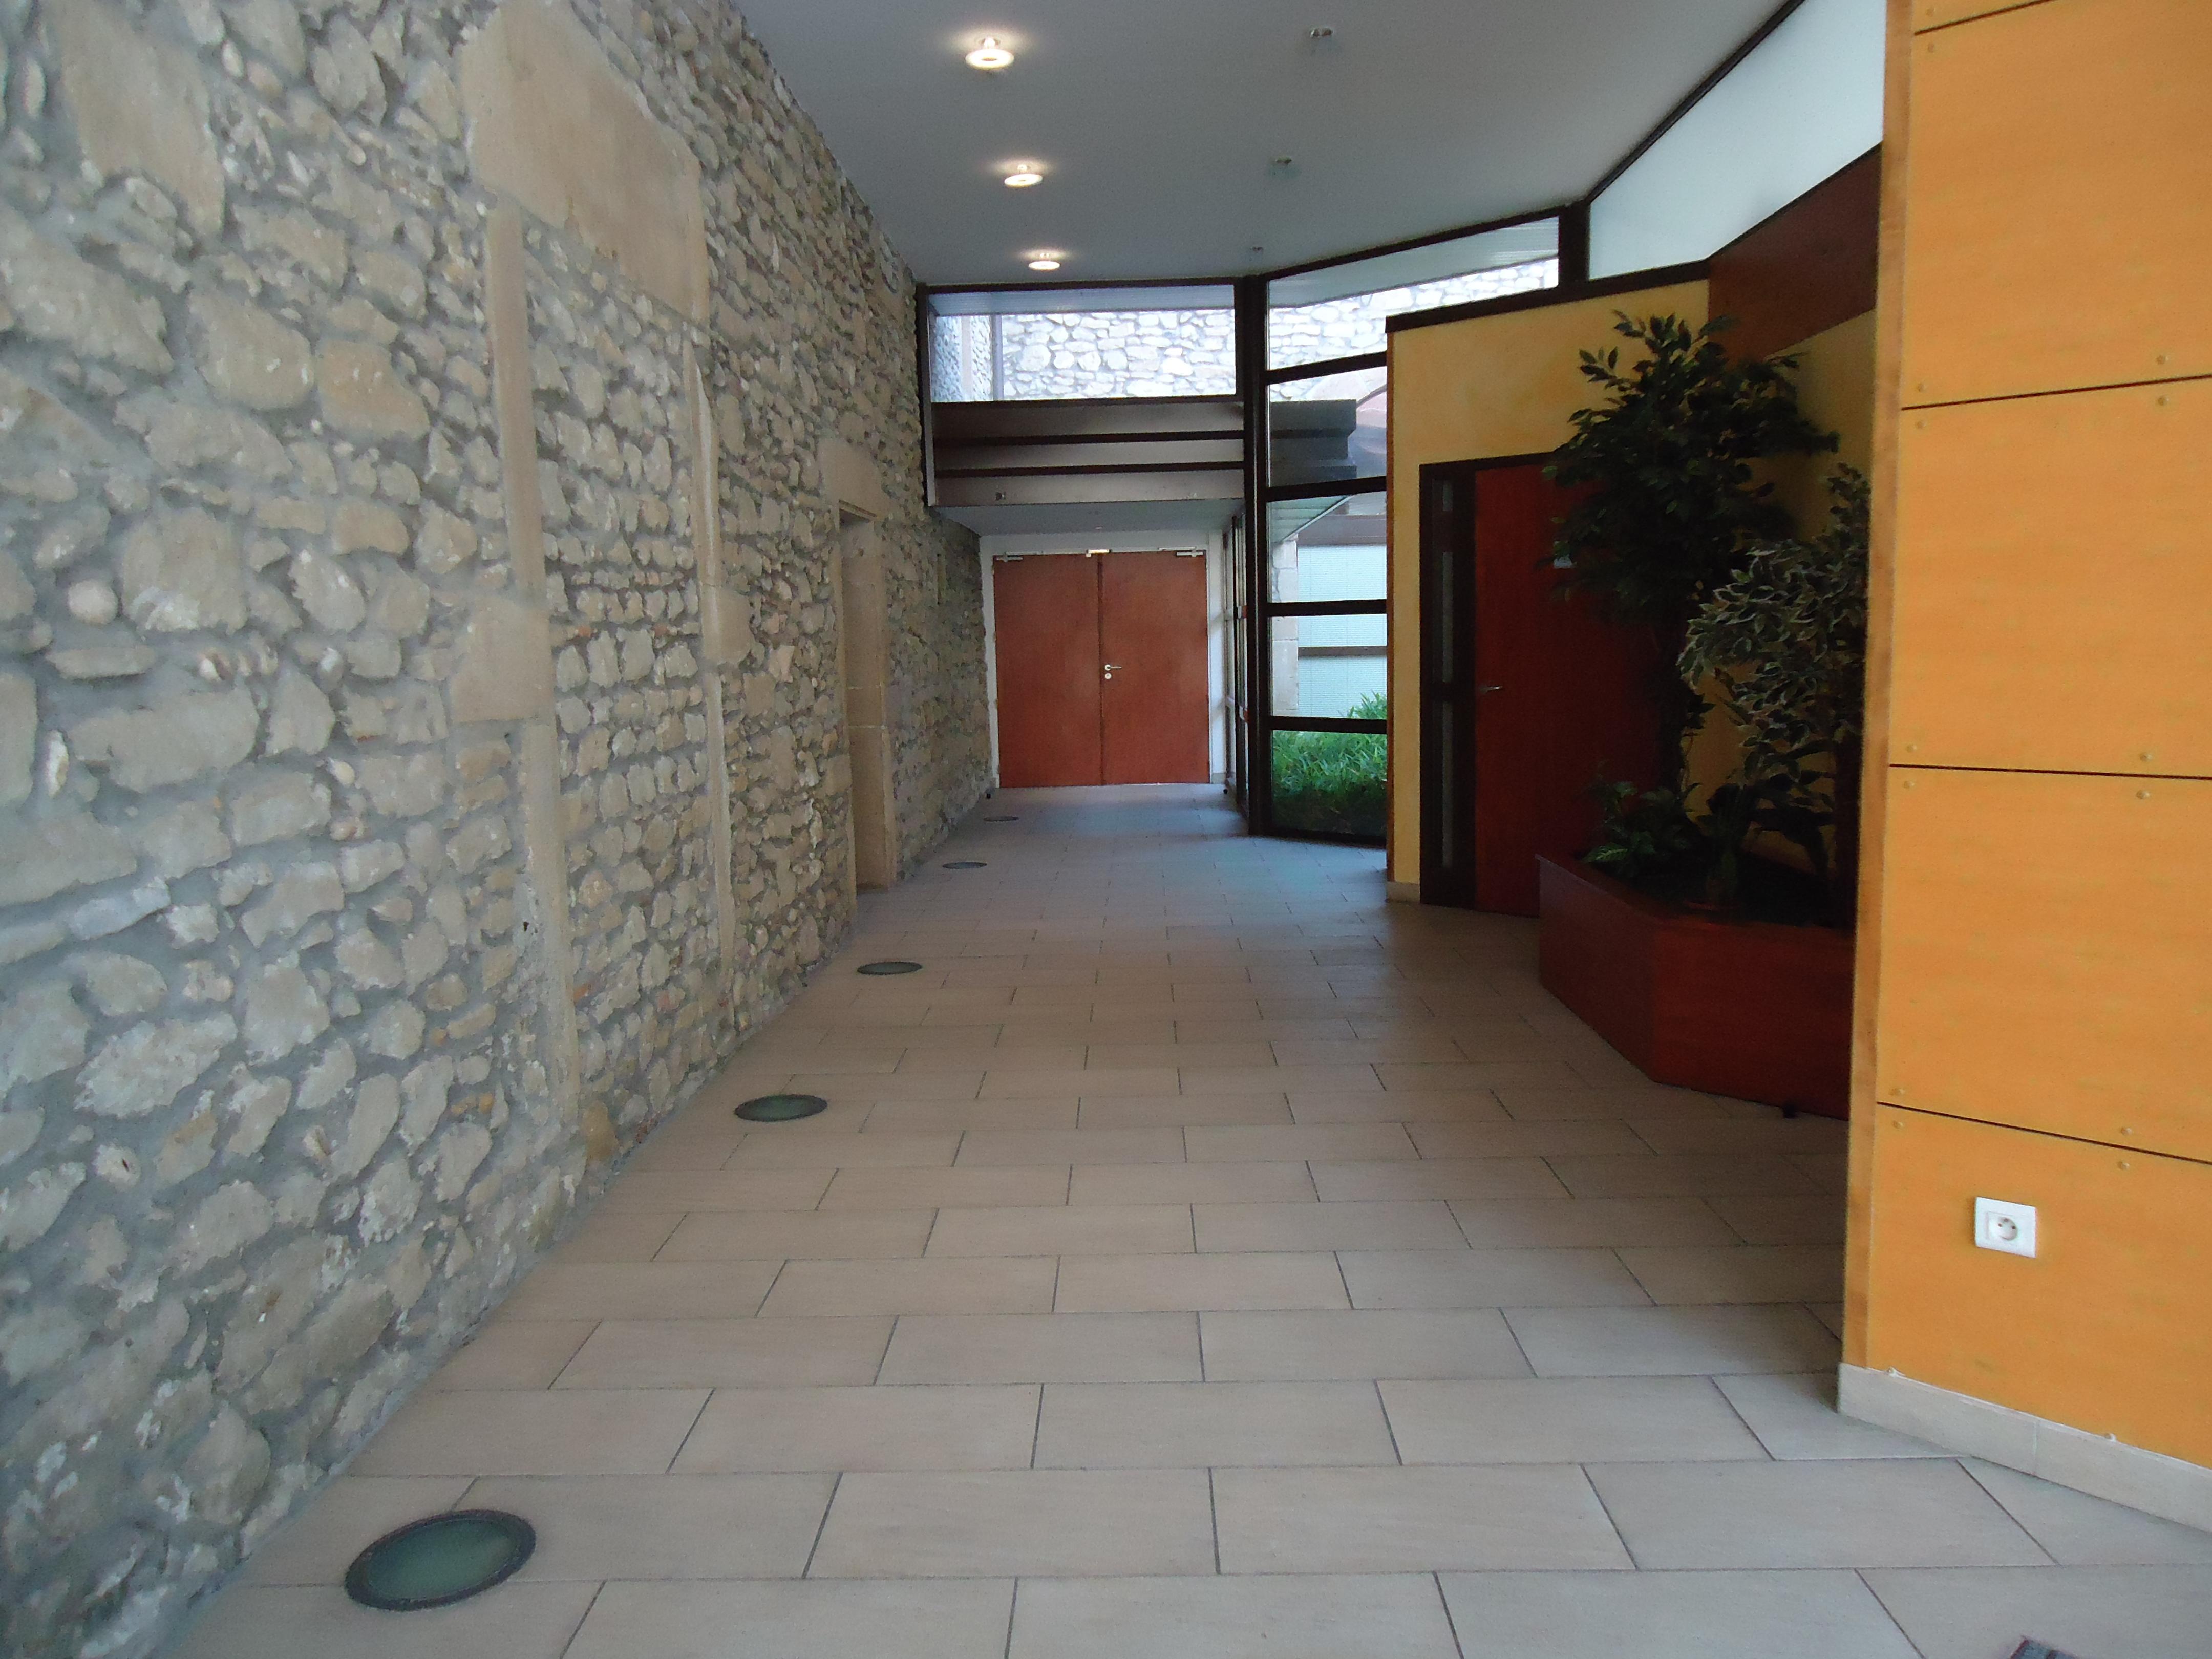 Halle d 39 entr e salle jennyaniss photos club doctissimo - Halle d entree ...